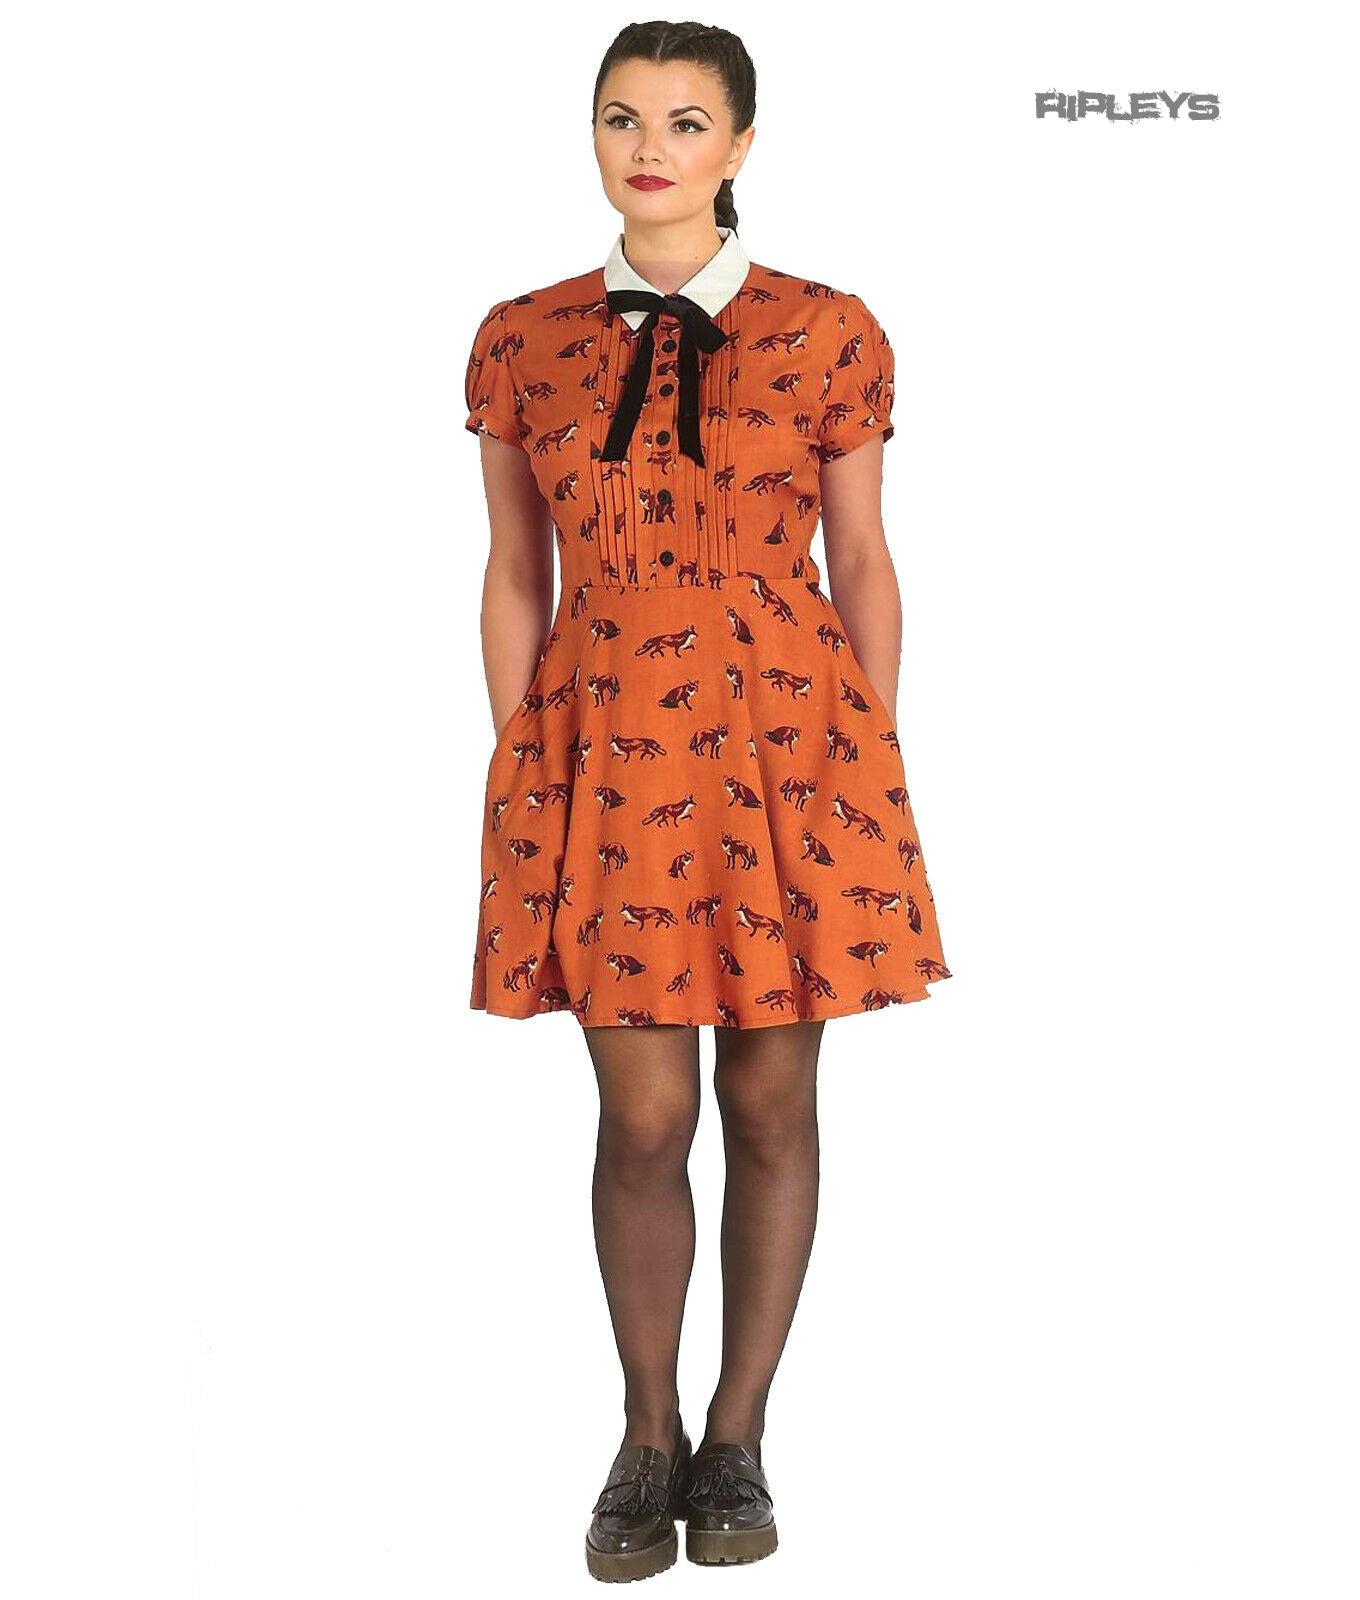 Hell-Bunny-40s-50s-Brown-Mini-Dress-Pin-Up-VIXEY-Vixen-Fox-Print-All-Sizes thumbnail 2